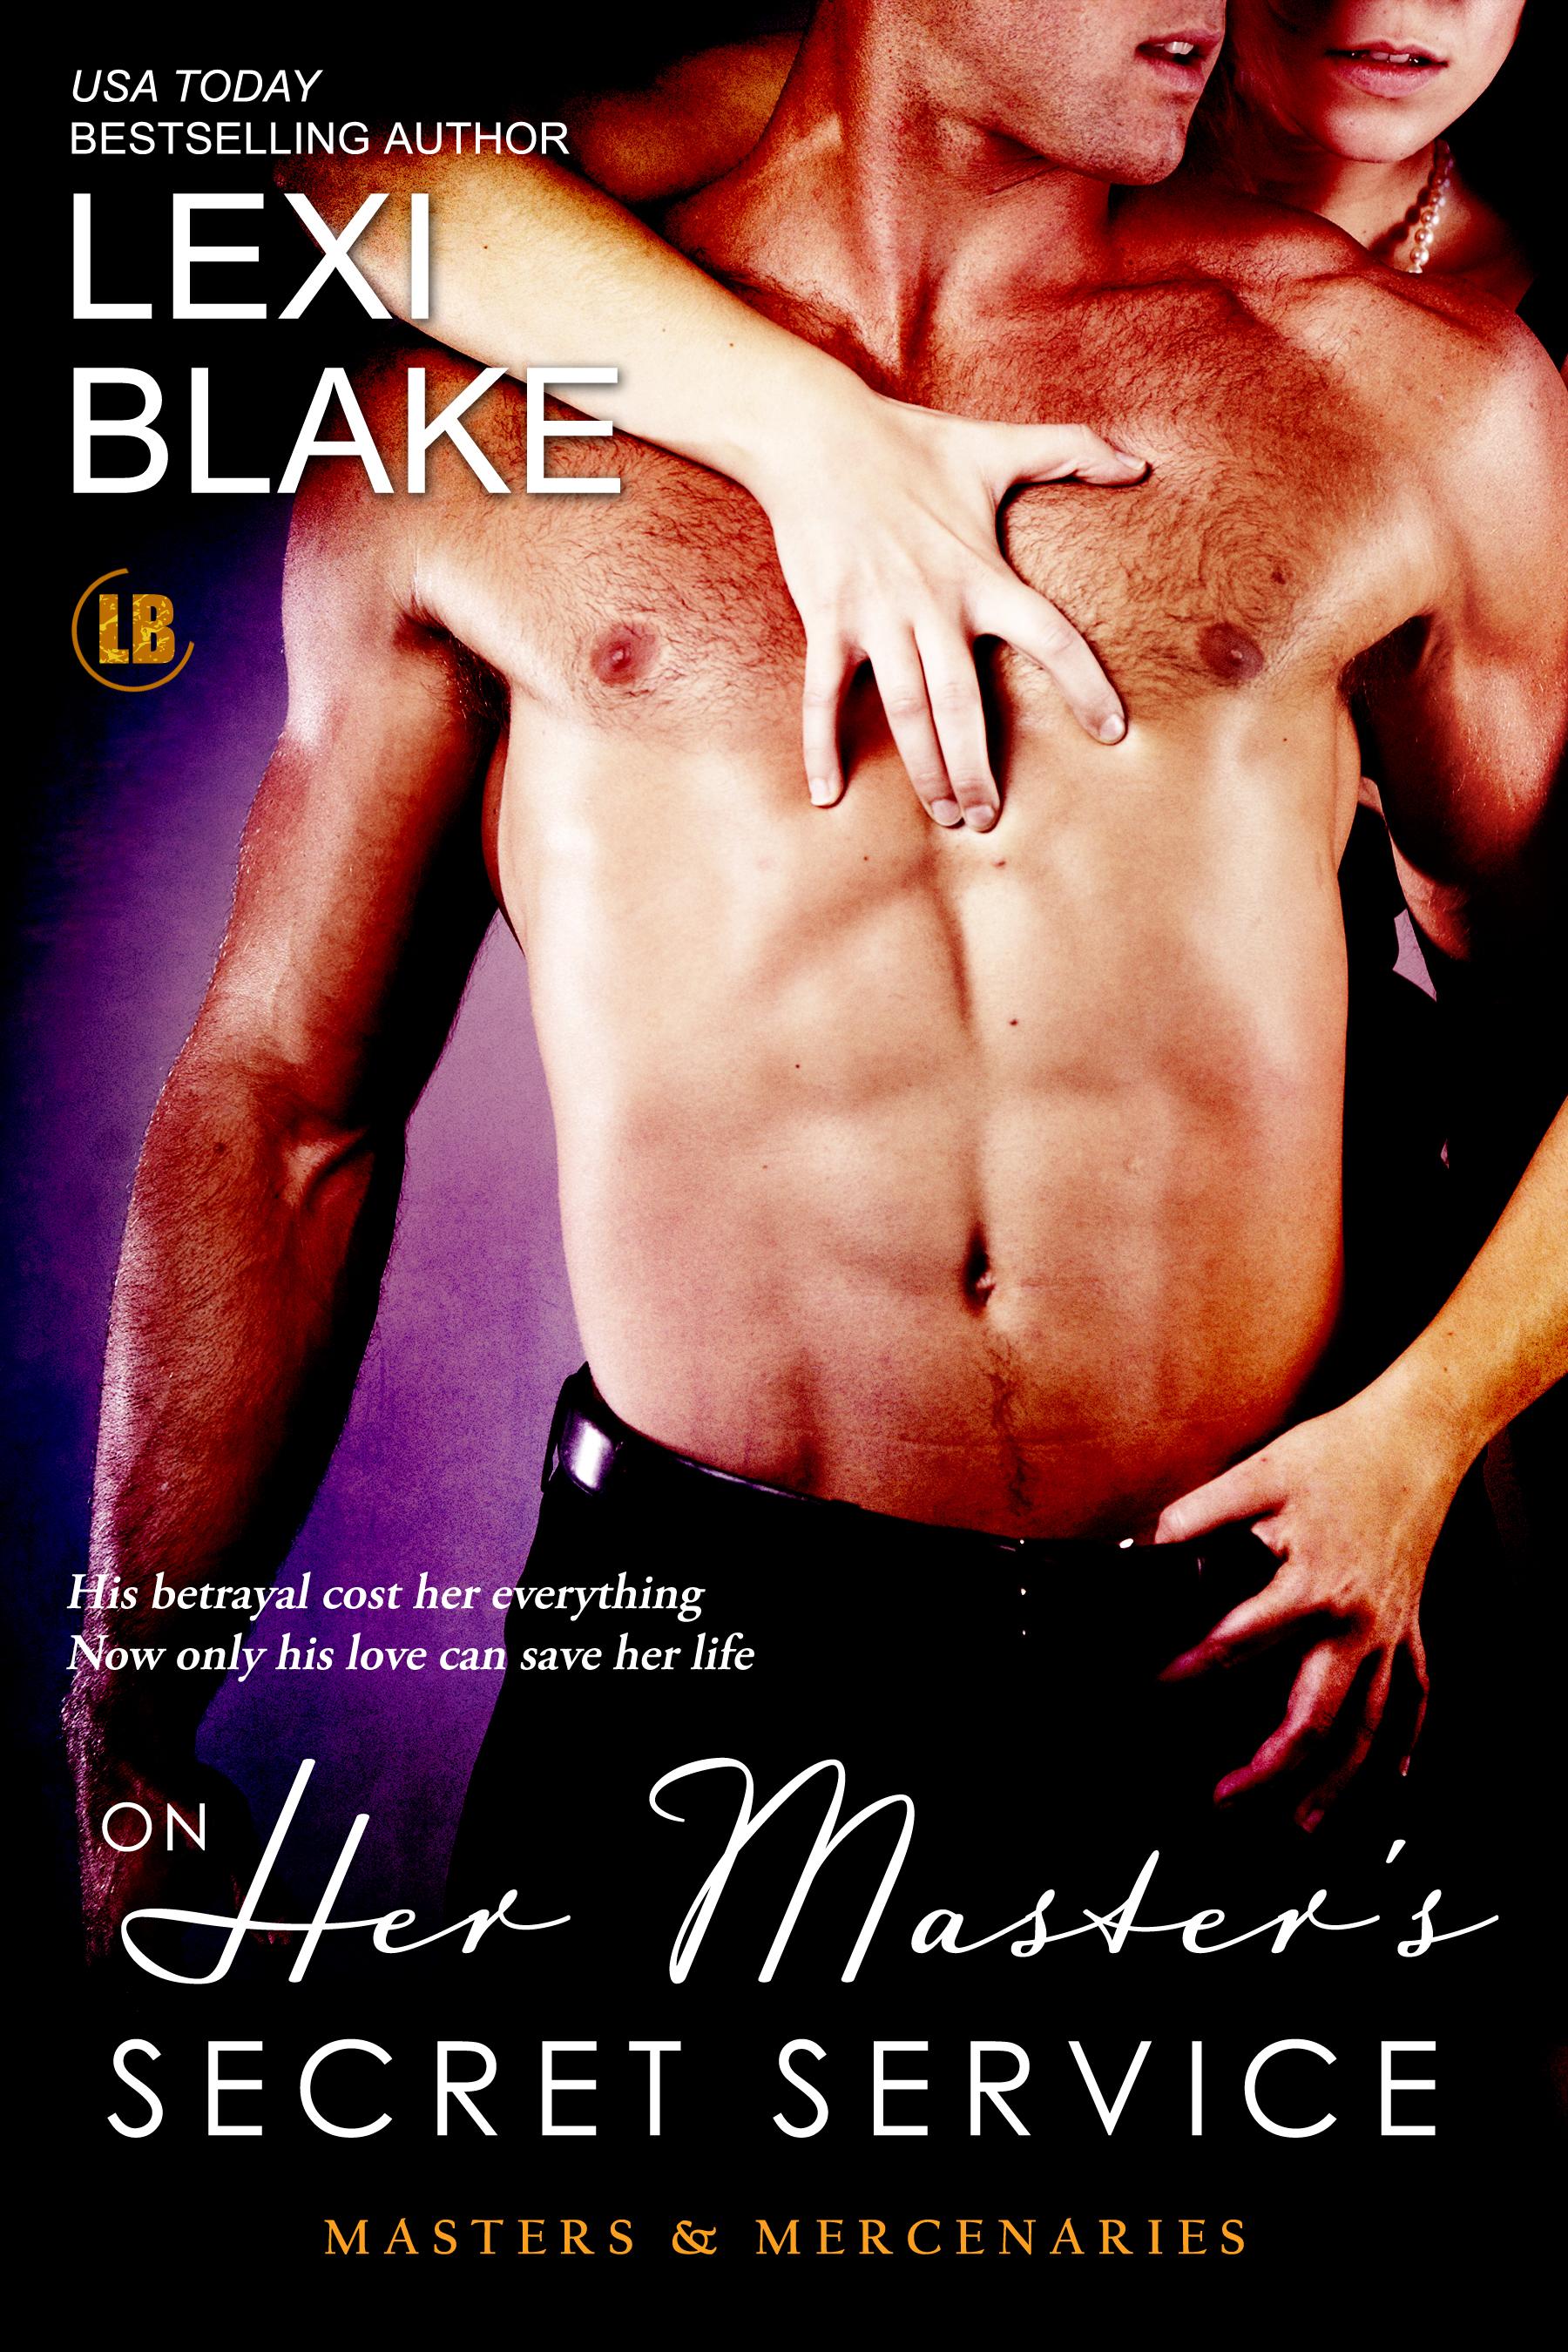 Lexi Blake - On Her Master's Secret Service, Masters and Mercenaries, Book 4